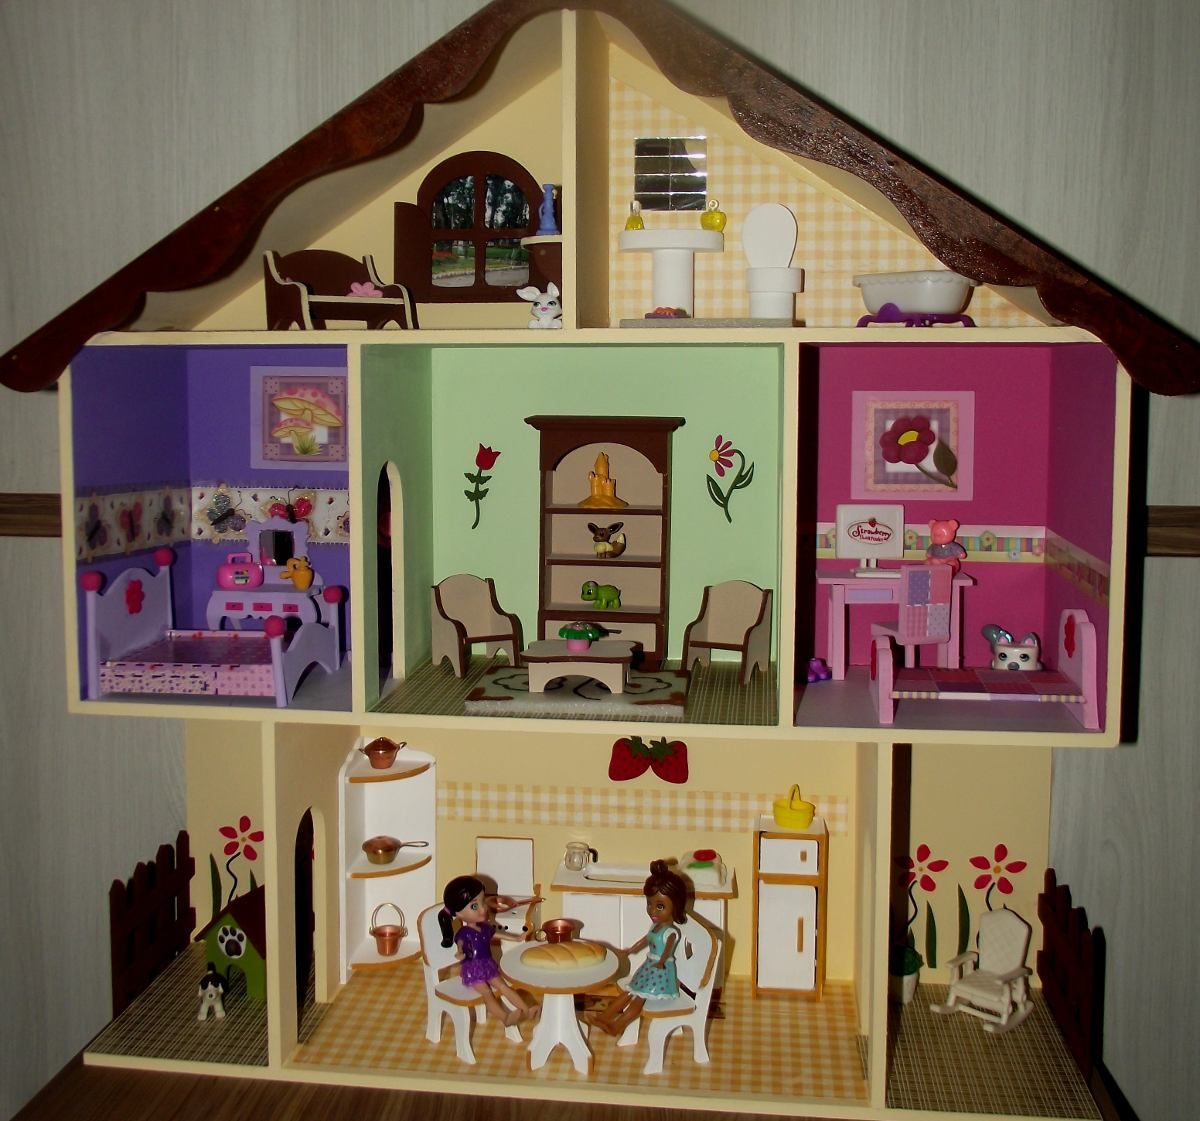 Casa De Boneca Completa - Bonecas Polly - Mdf - R$ 249,99 no ...